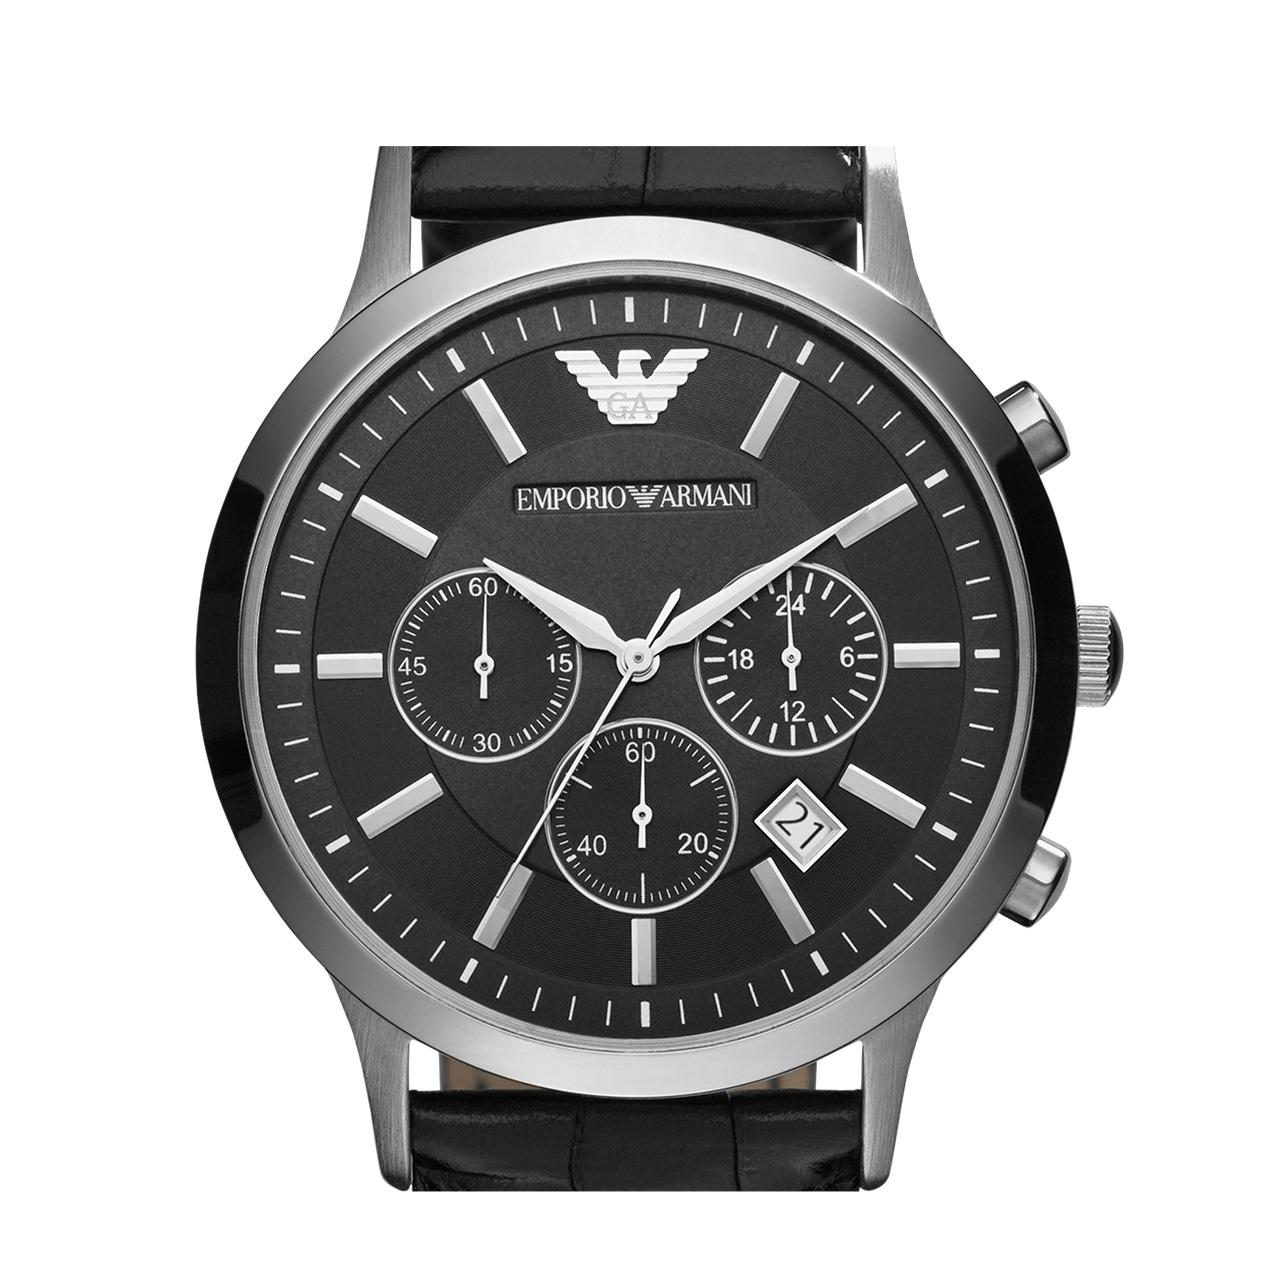 Armani官方正品阿玛尼皮带手表男 多功能时尚防水三眼男表AR2447